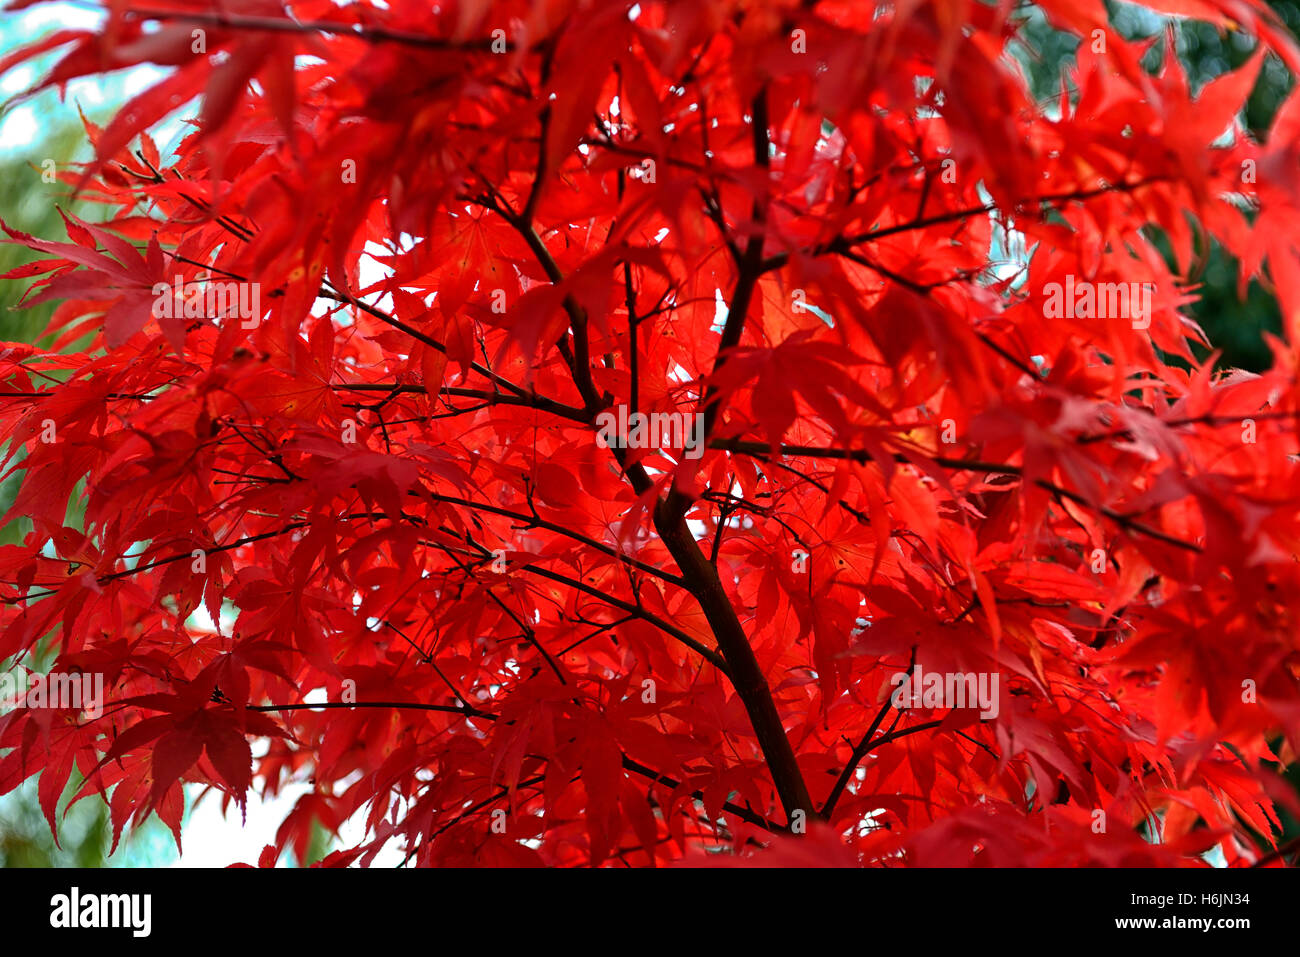 Acer Palmatum Osakazuki Japanese Maple Red Leaves Autumn Autumnal